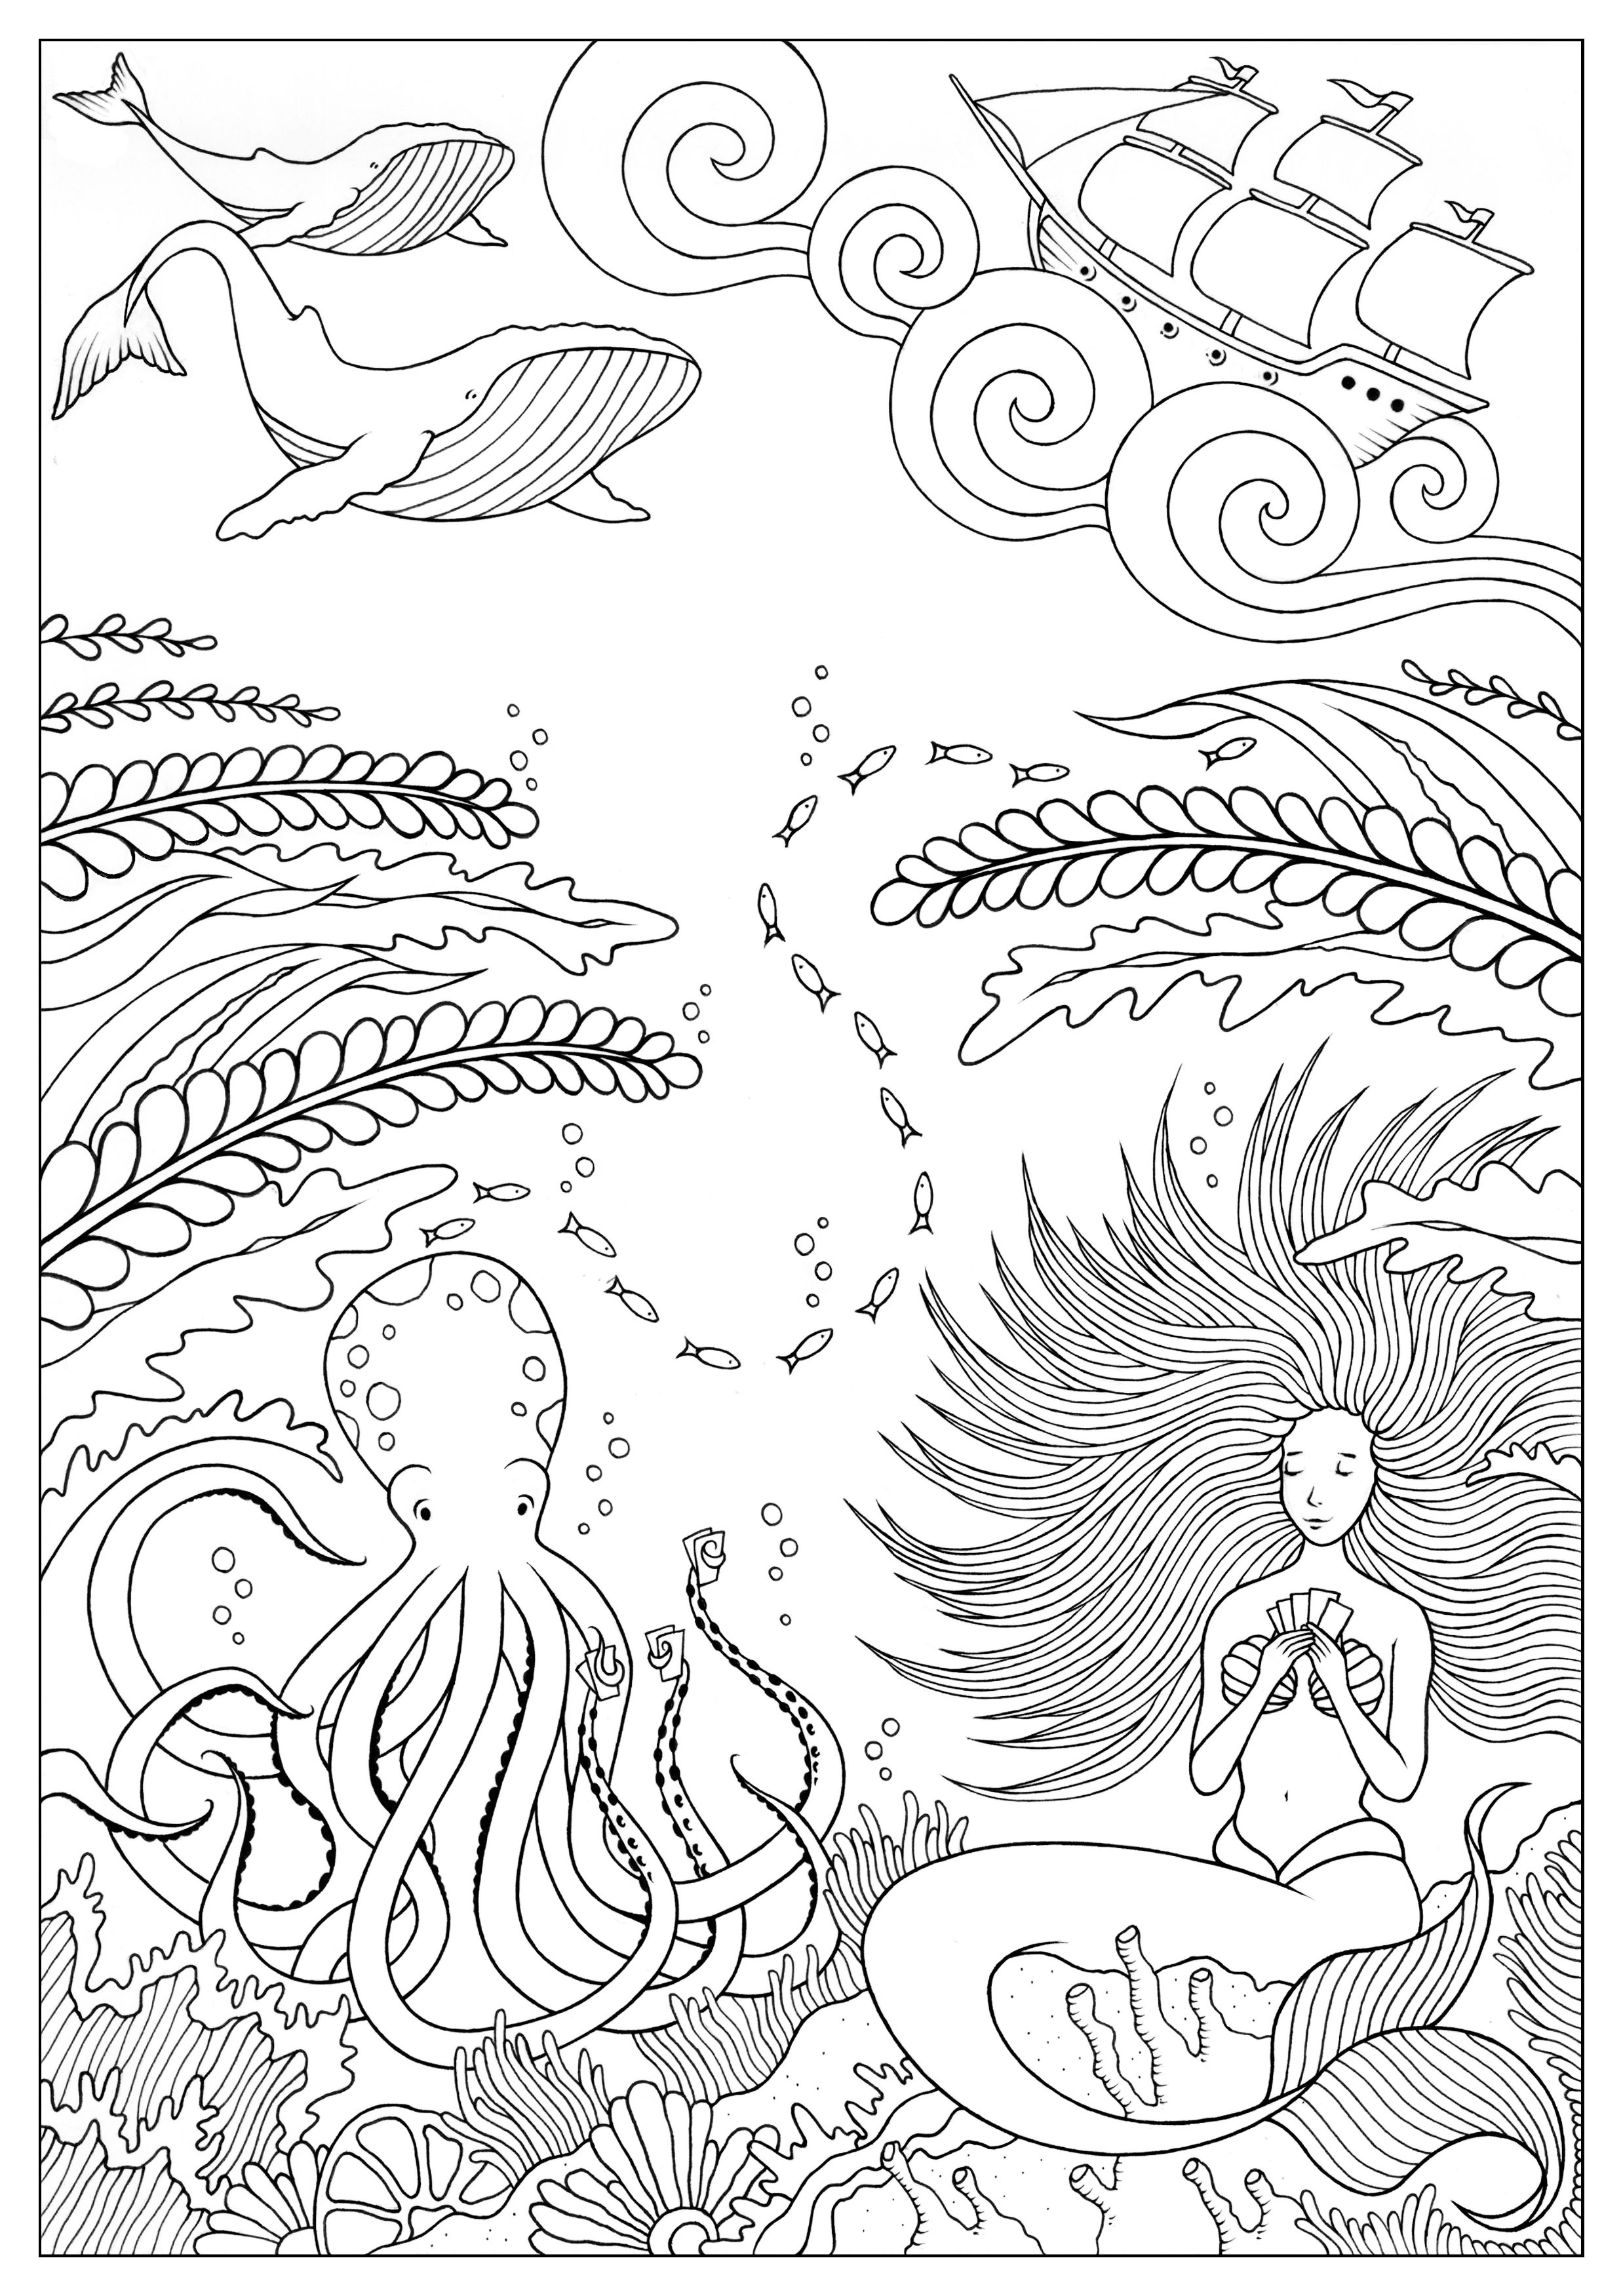 Malbuch Fur Erwachsene : Meerjungfrauen - 4